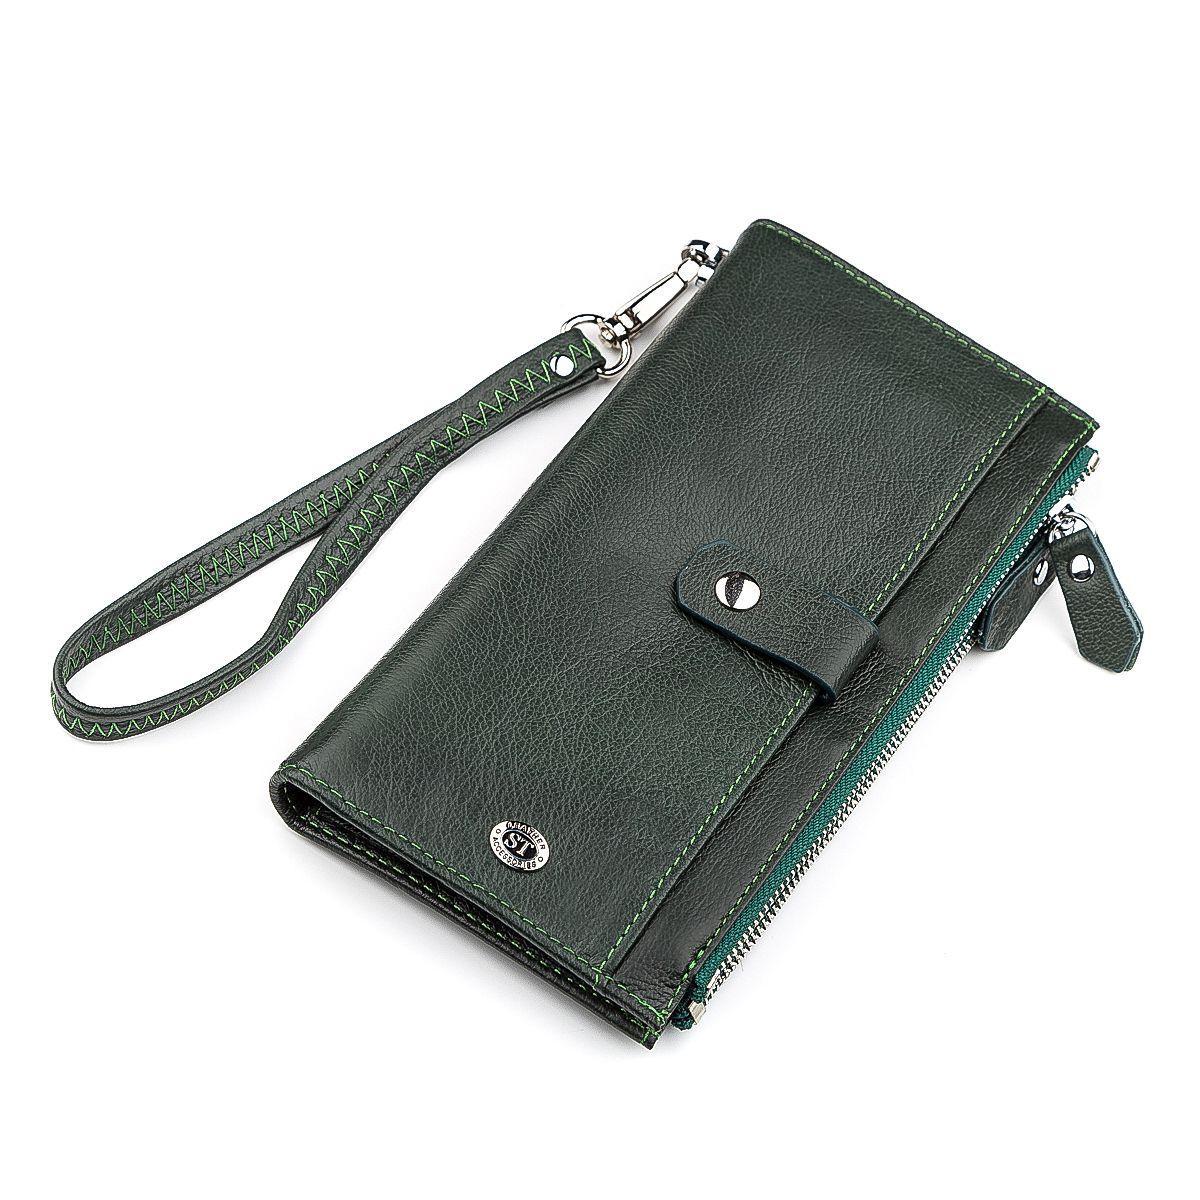 Кошелек Женский St Leather 18380 (St420) Кожаный Зеленый, Зеленый